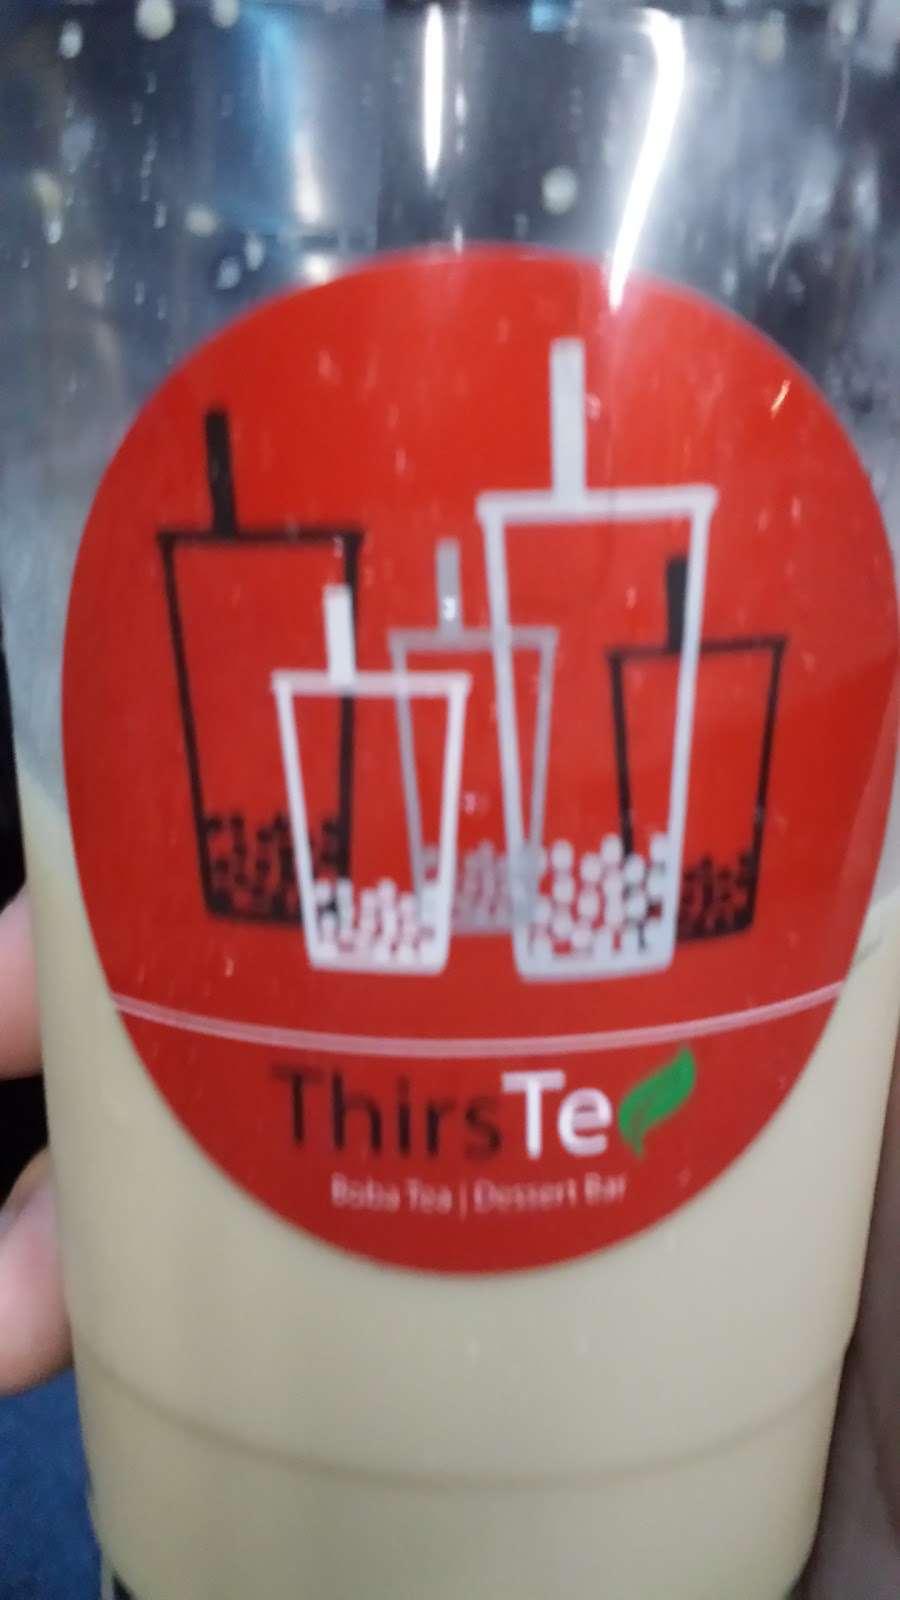 ThirsTea - cafe    Photo 10 of 10   Address: 6585 Commerce Blvd, Rohnert Park, CA 94928, USA   Phone: (707) 303-7868